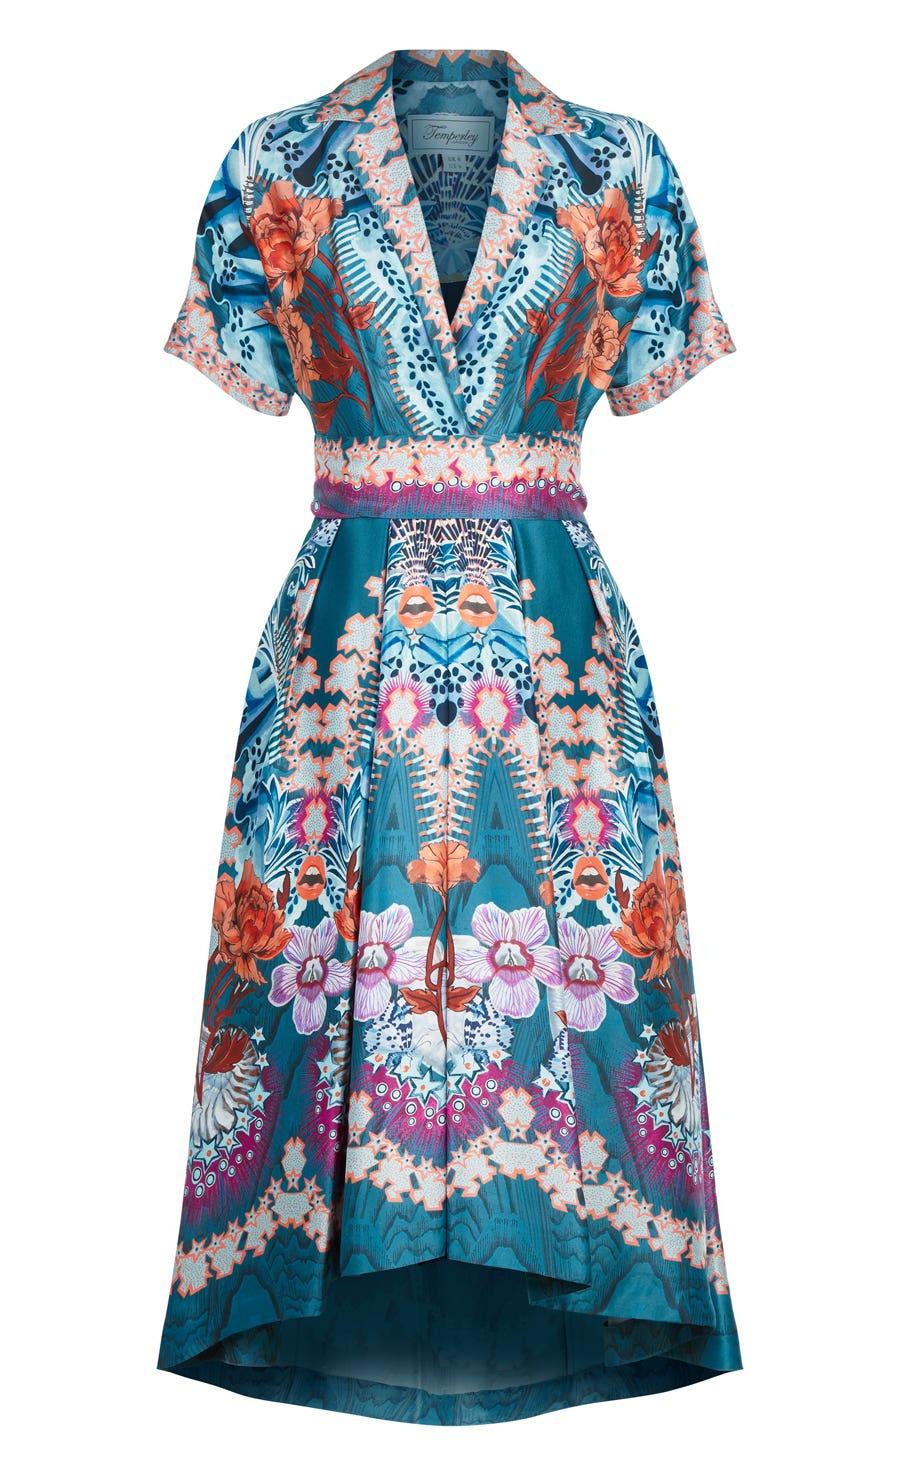 Pipe Dream Belt Dress, Peacock Mix